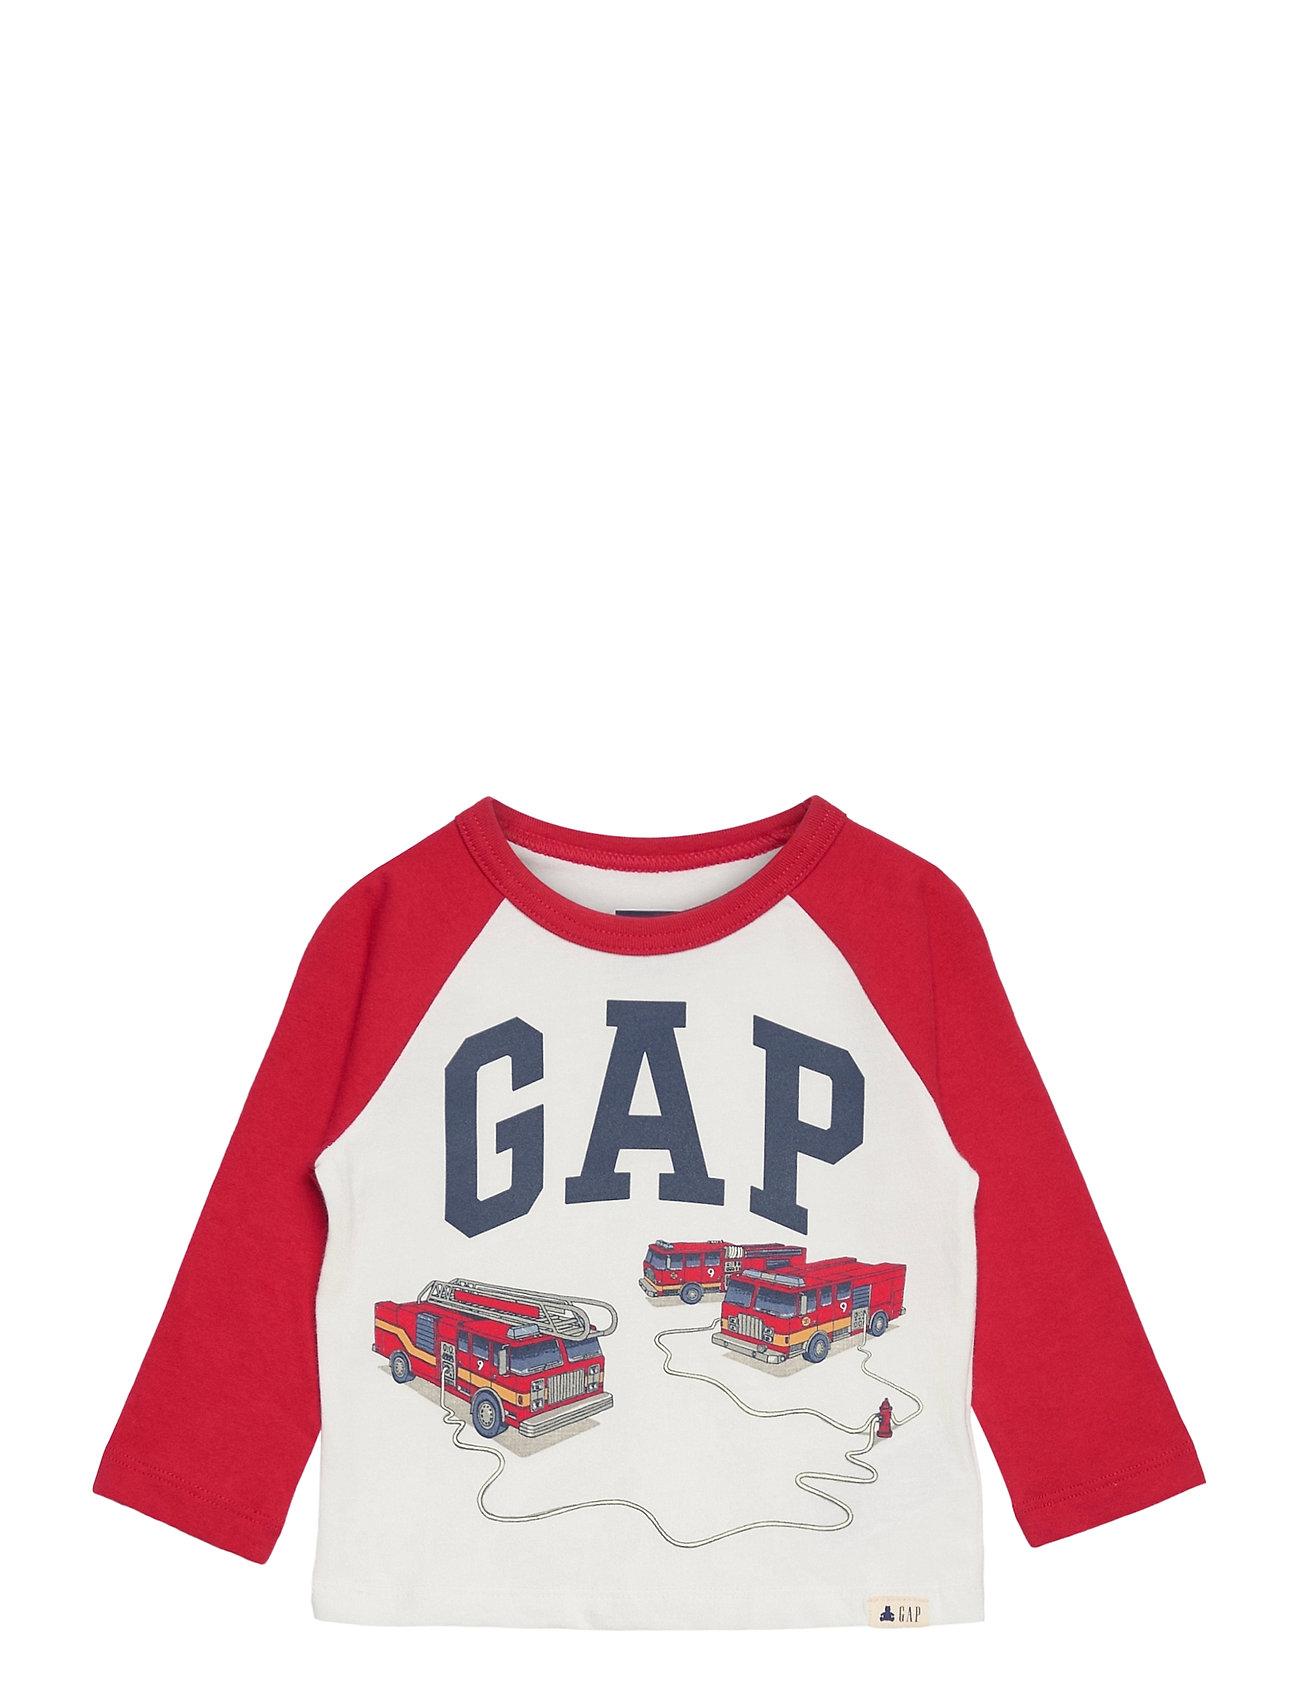 Image of Toddler Mix And Match Gap Logo Graphic Shirt Langærmet T-shirt Hvid GAP (3456630531)